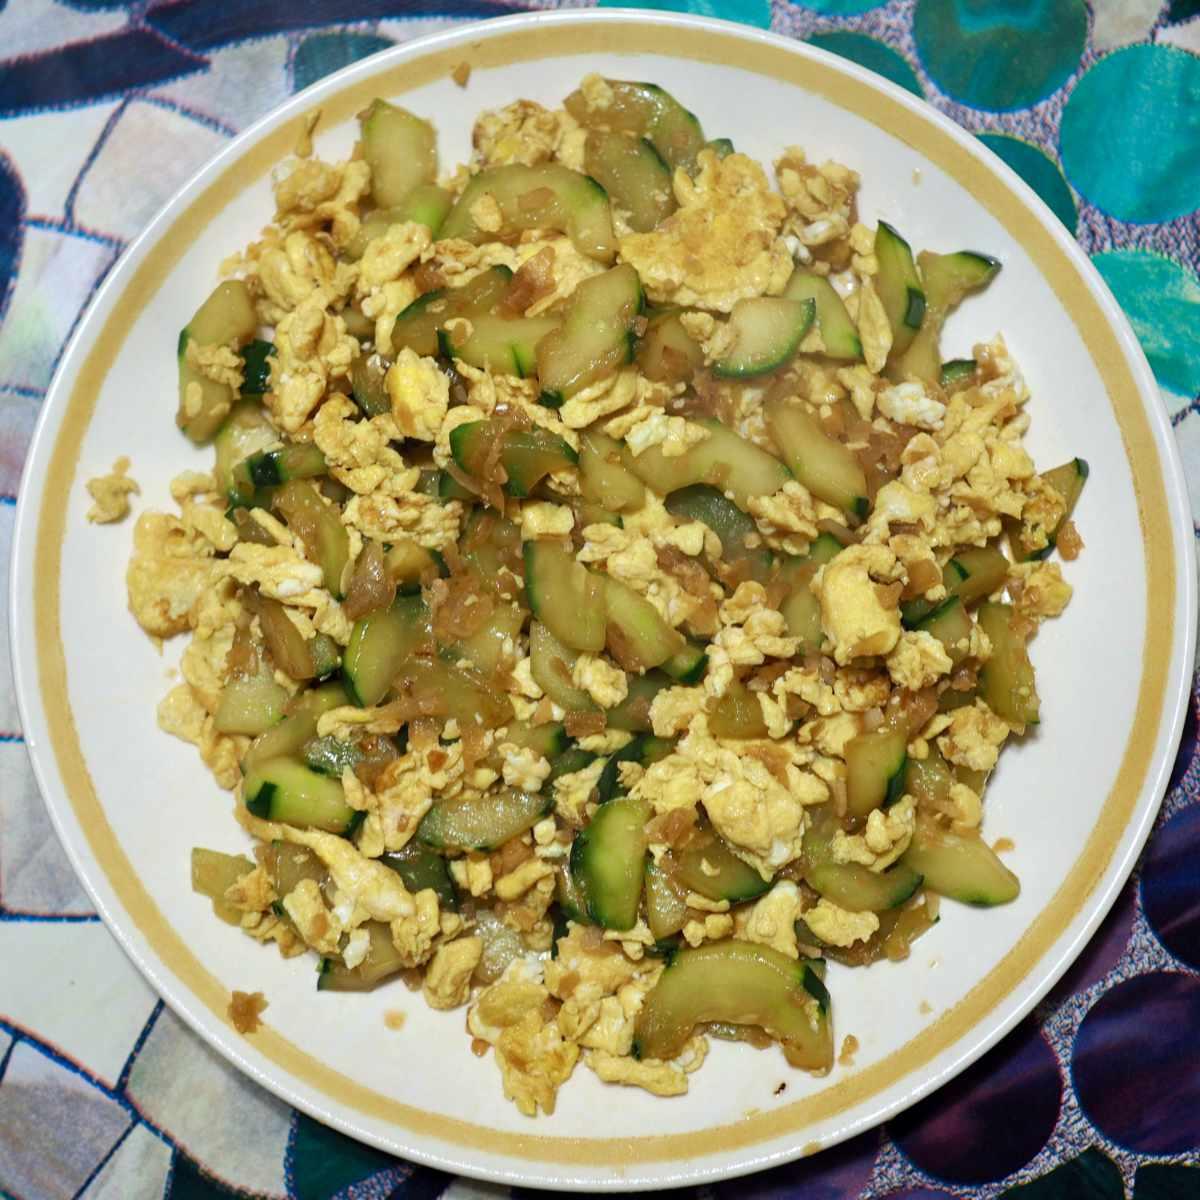 Cucumber egg stir fry